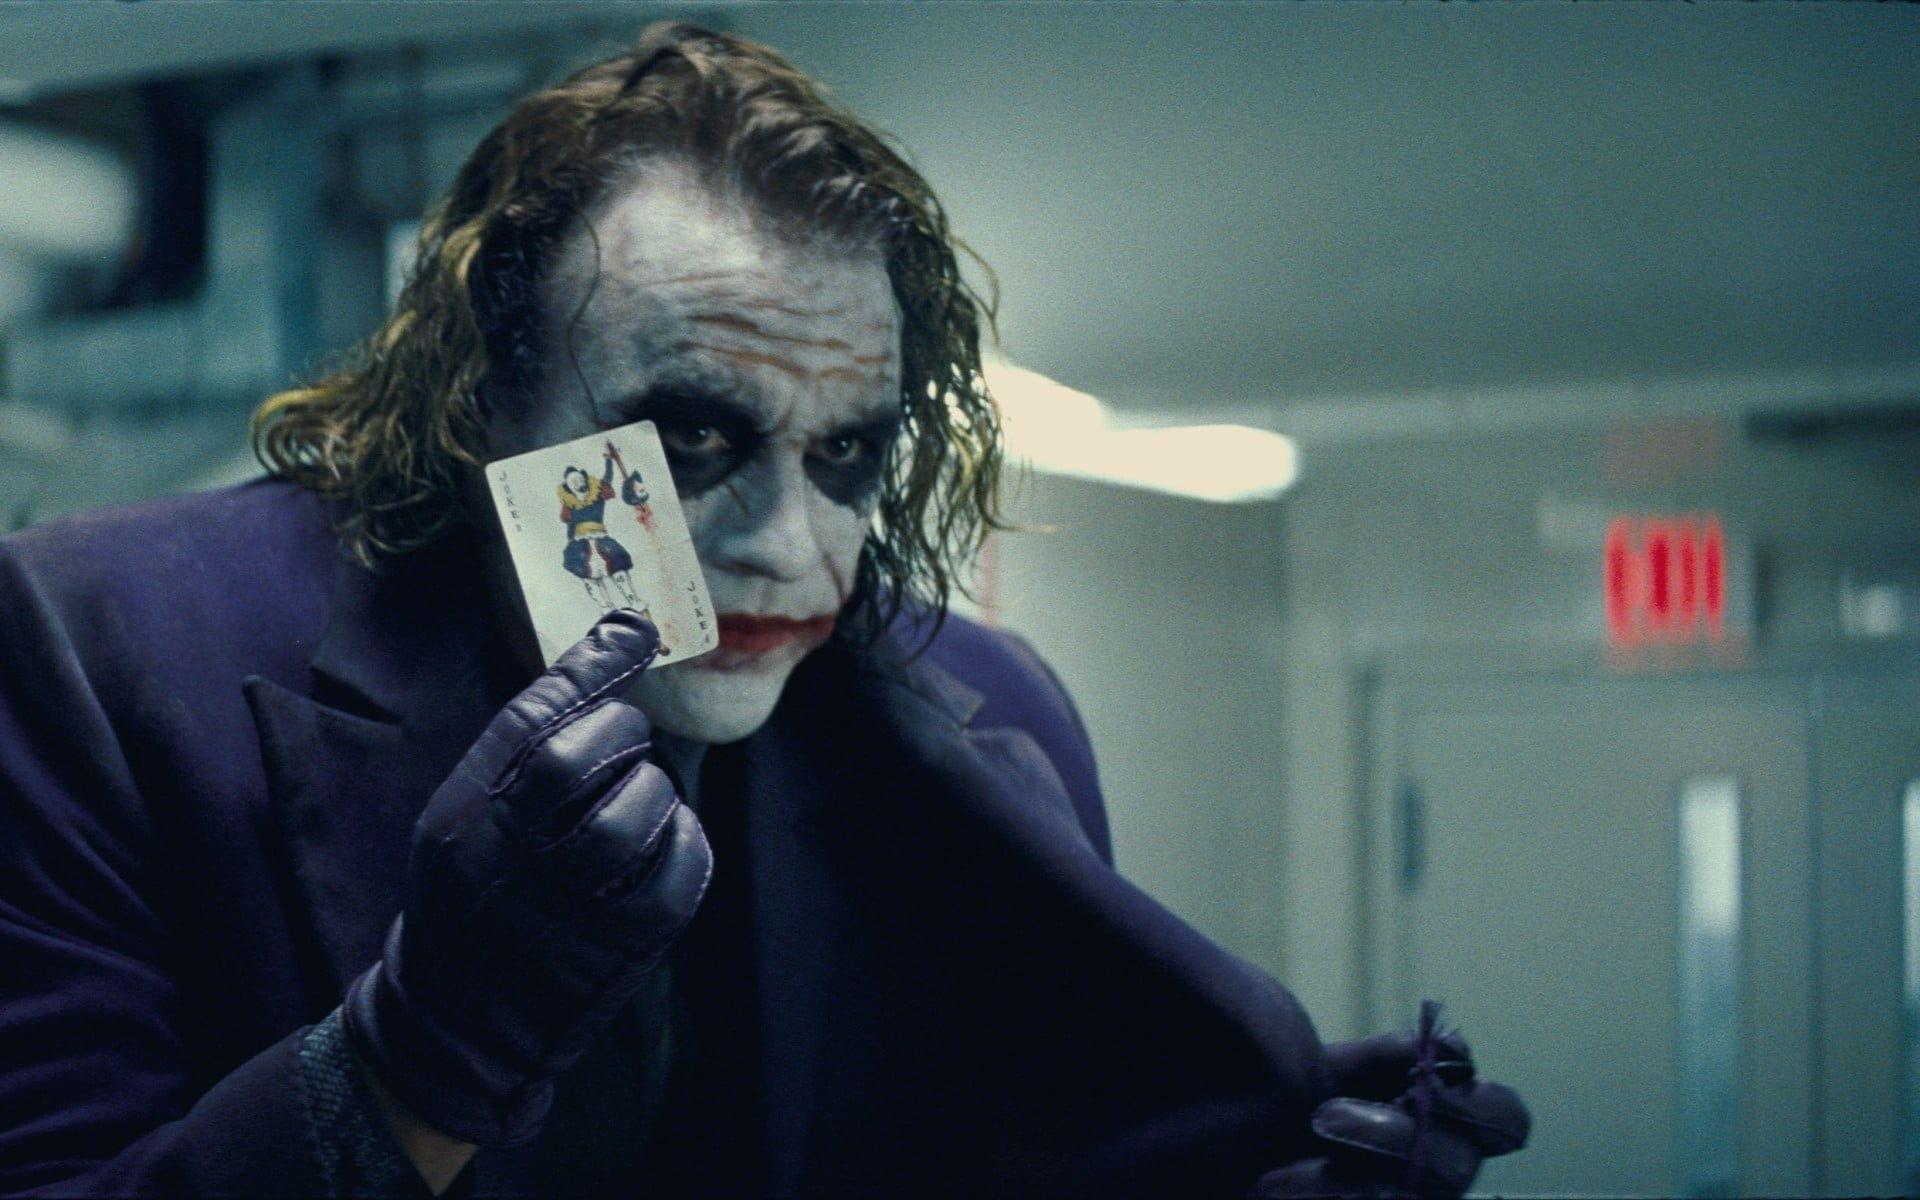 Joker Movies The Dark Knight Joker Heath Ledger 1080p Wallpaper Hdwallpaper Desktop Superhero Movies Dark Knight Heath Ledger